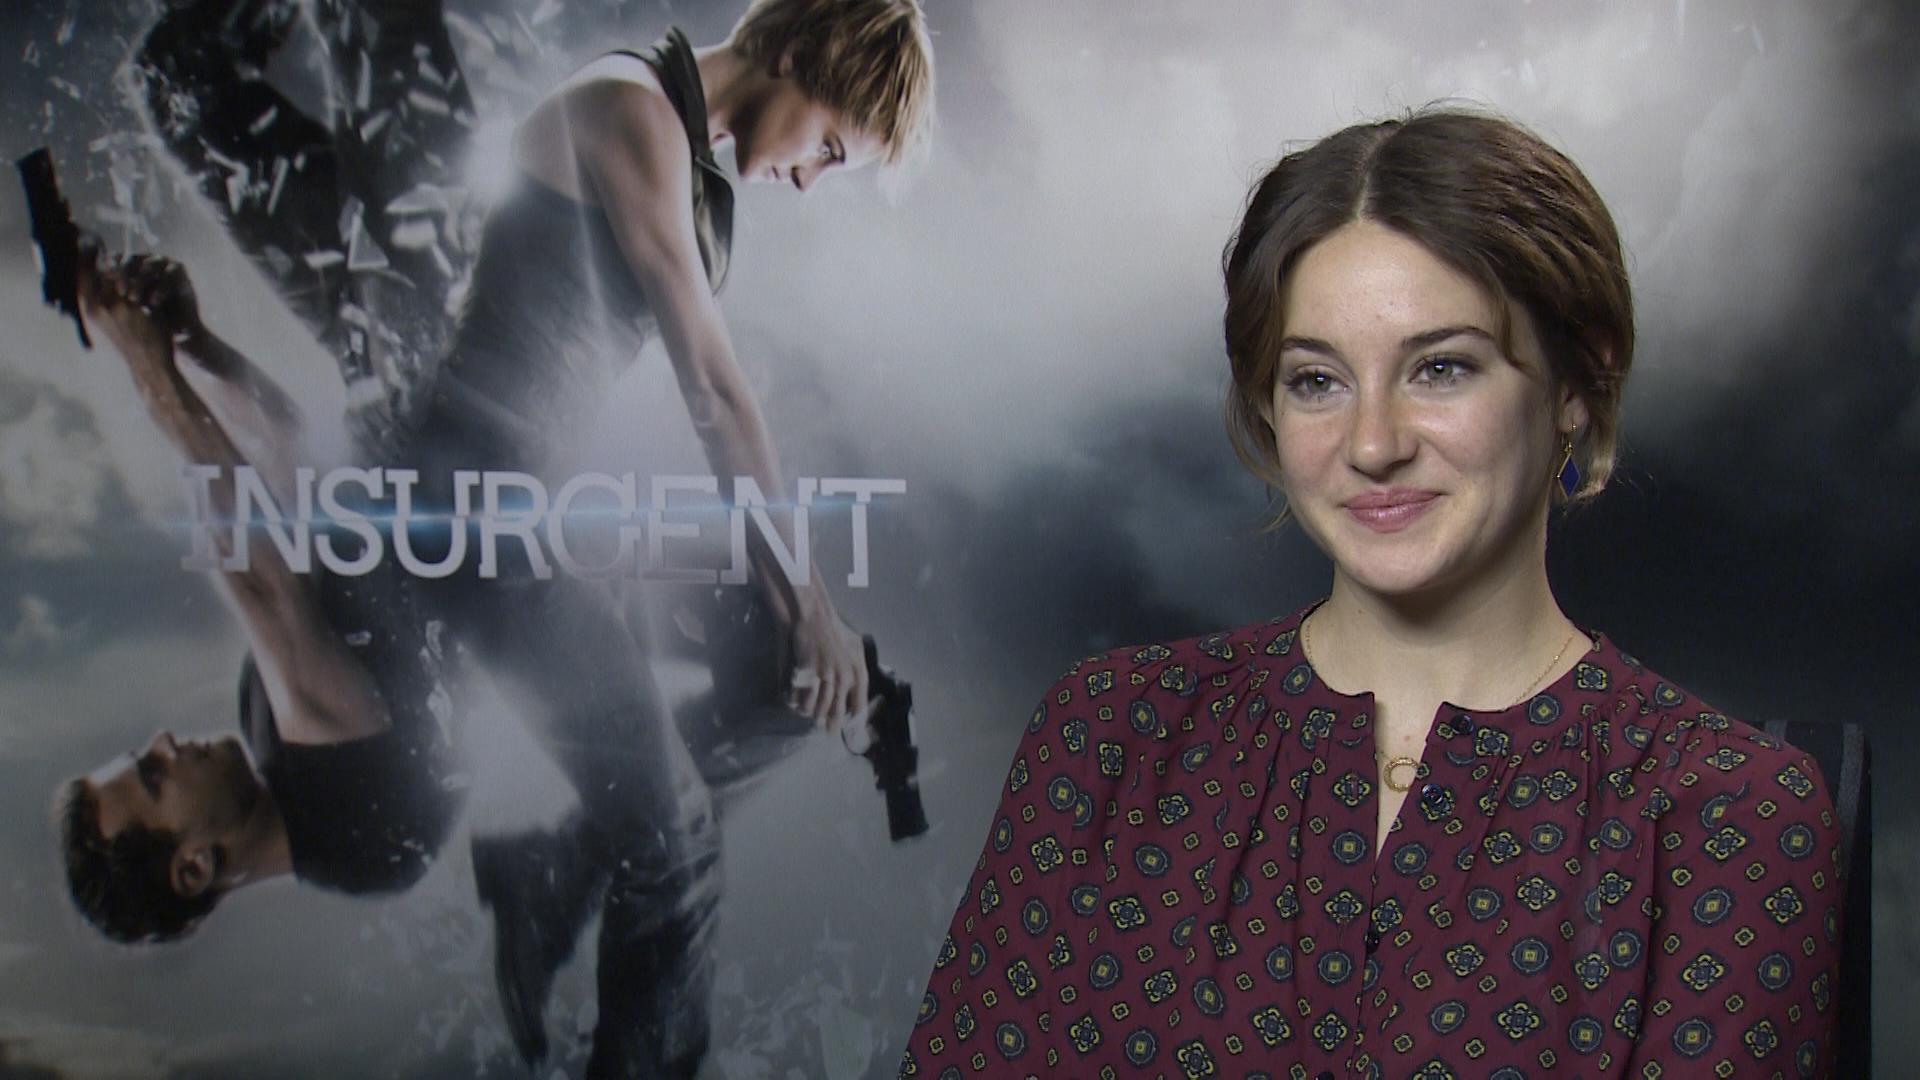 The Heyuguys Interview Shailene Woodley On Playing Tris In Insurgent Her Love Of Marvel Snowden Heyuguys